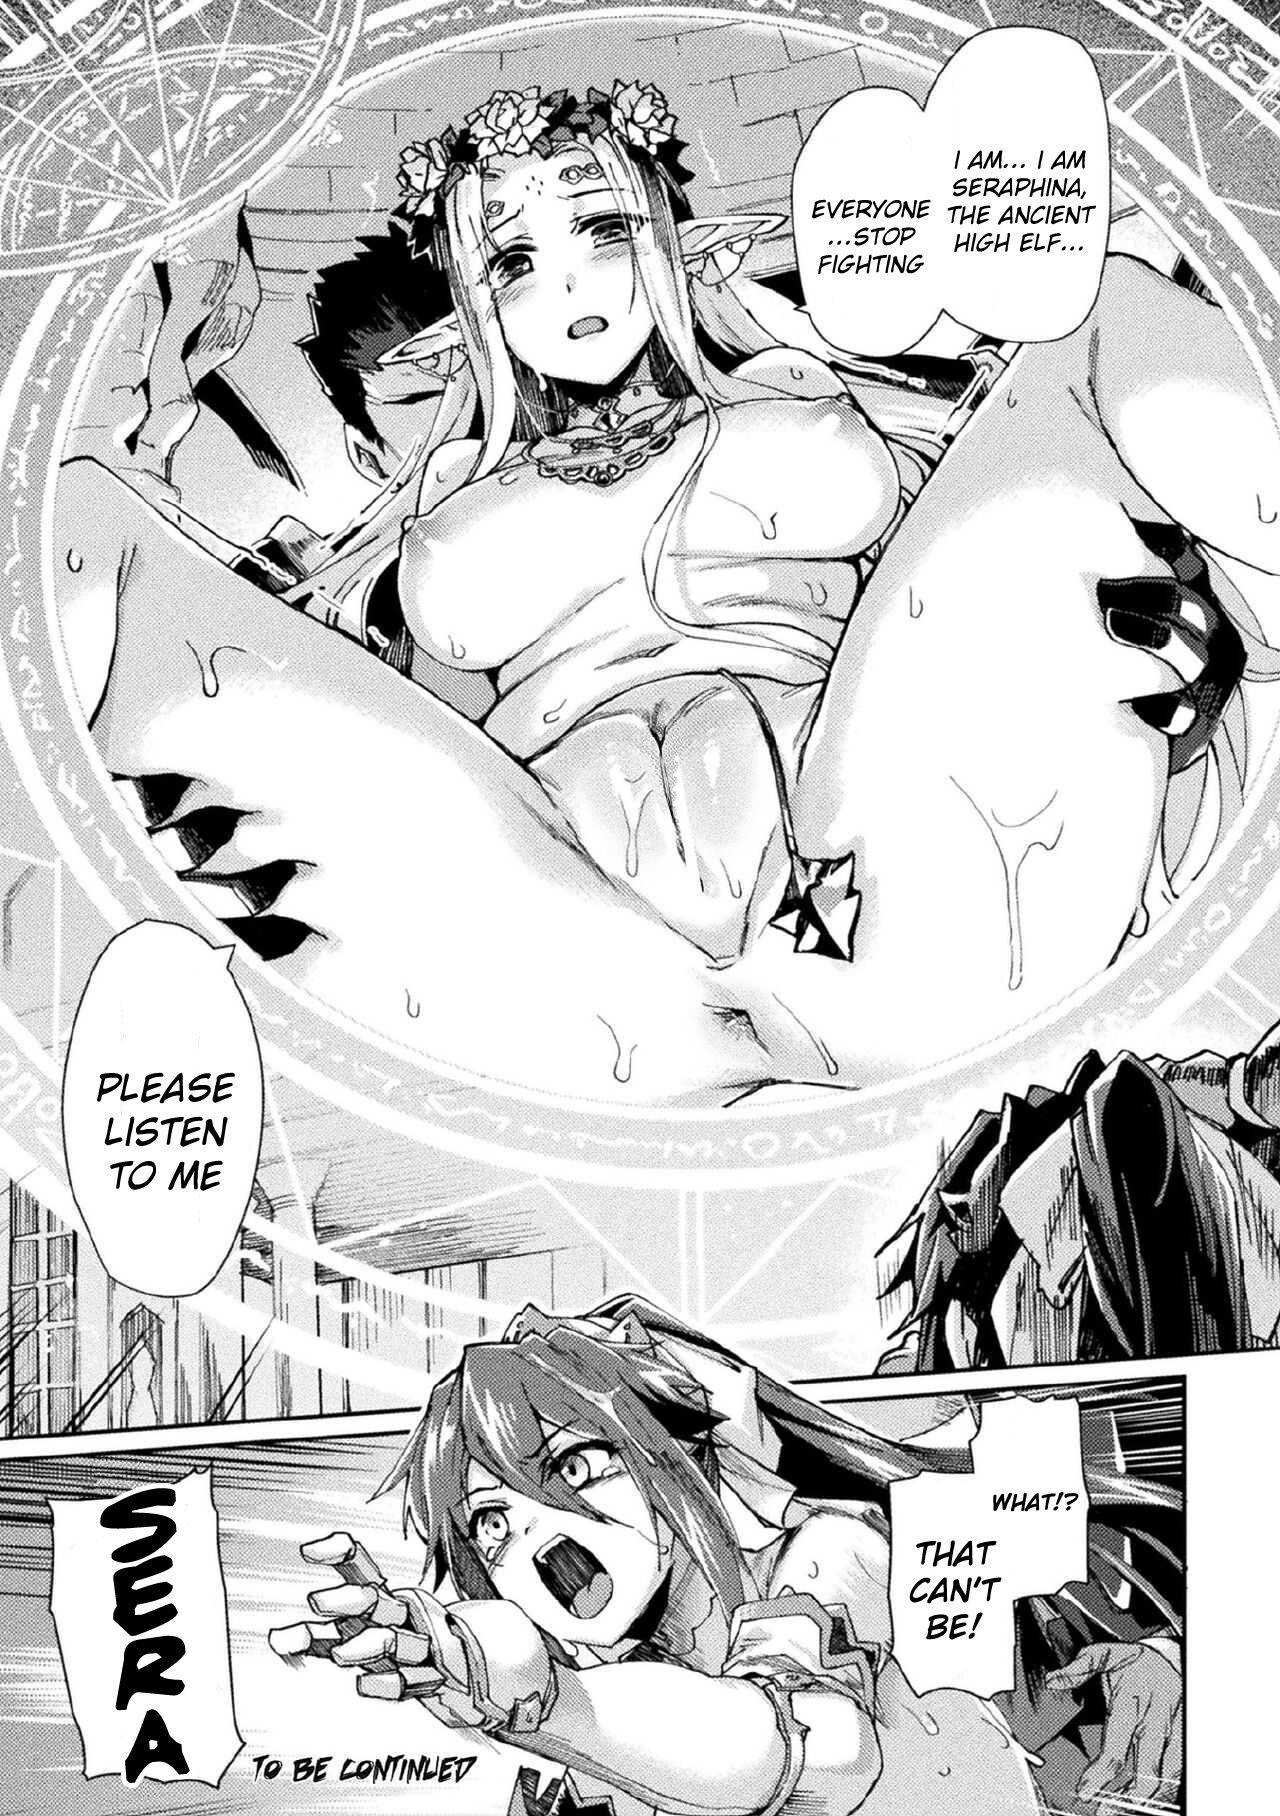 [Tsukitokage] Kuroinu II ~Inyoku ni Somaru Haitoku no Miyako, Futatabi~ THE COMIC Chapter 7 (Kukkoro Heroines Vol. 9) [English] [Decensored] (Klub Kemoner) [Digital] 23